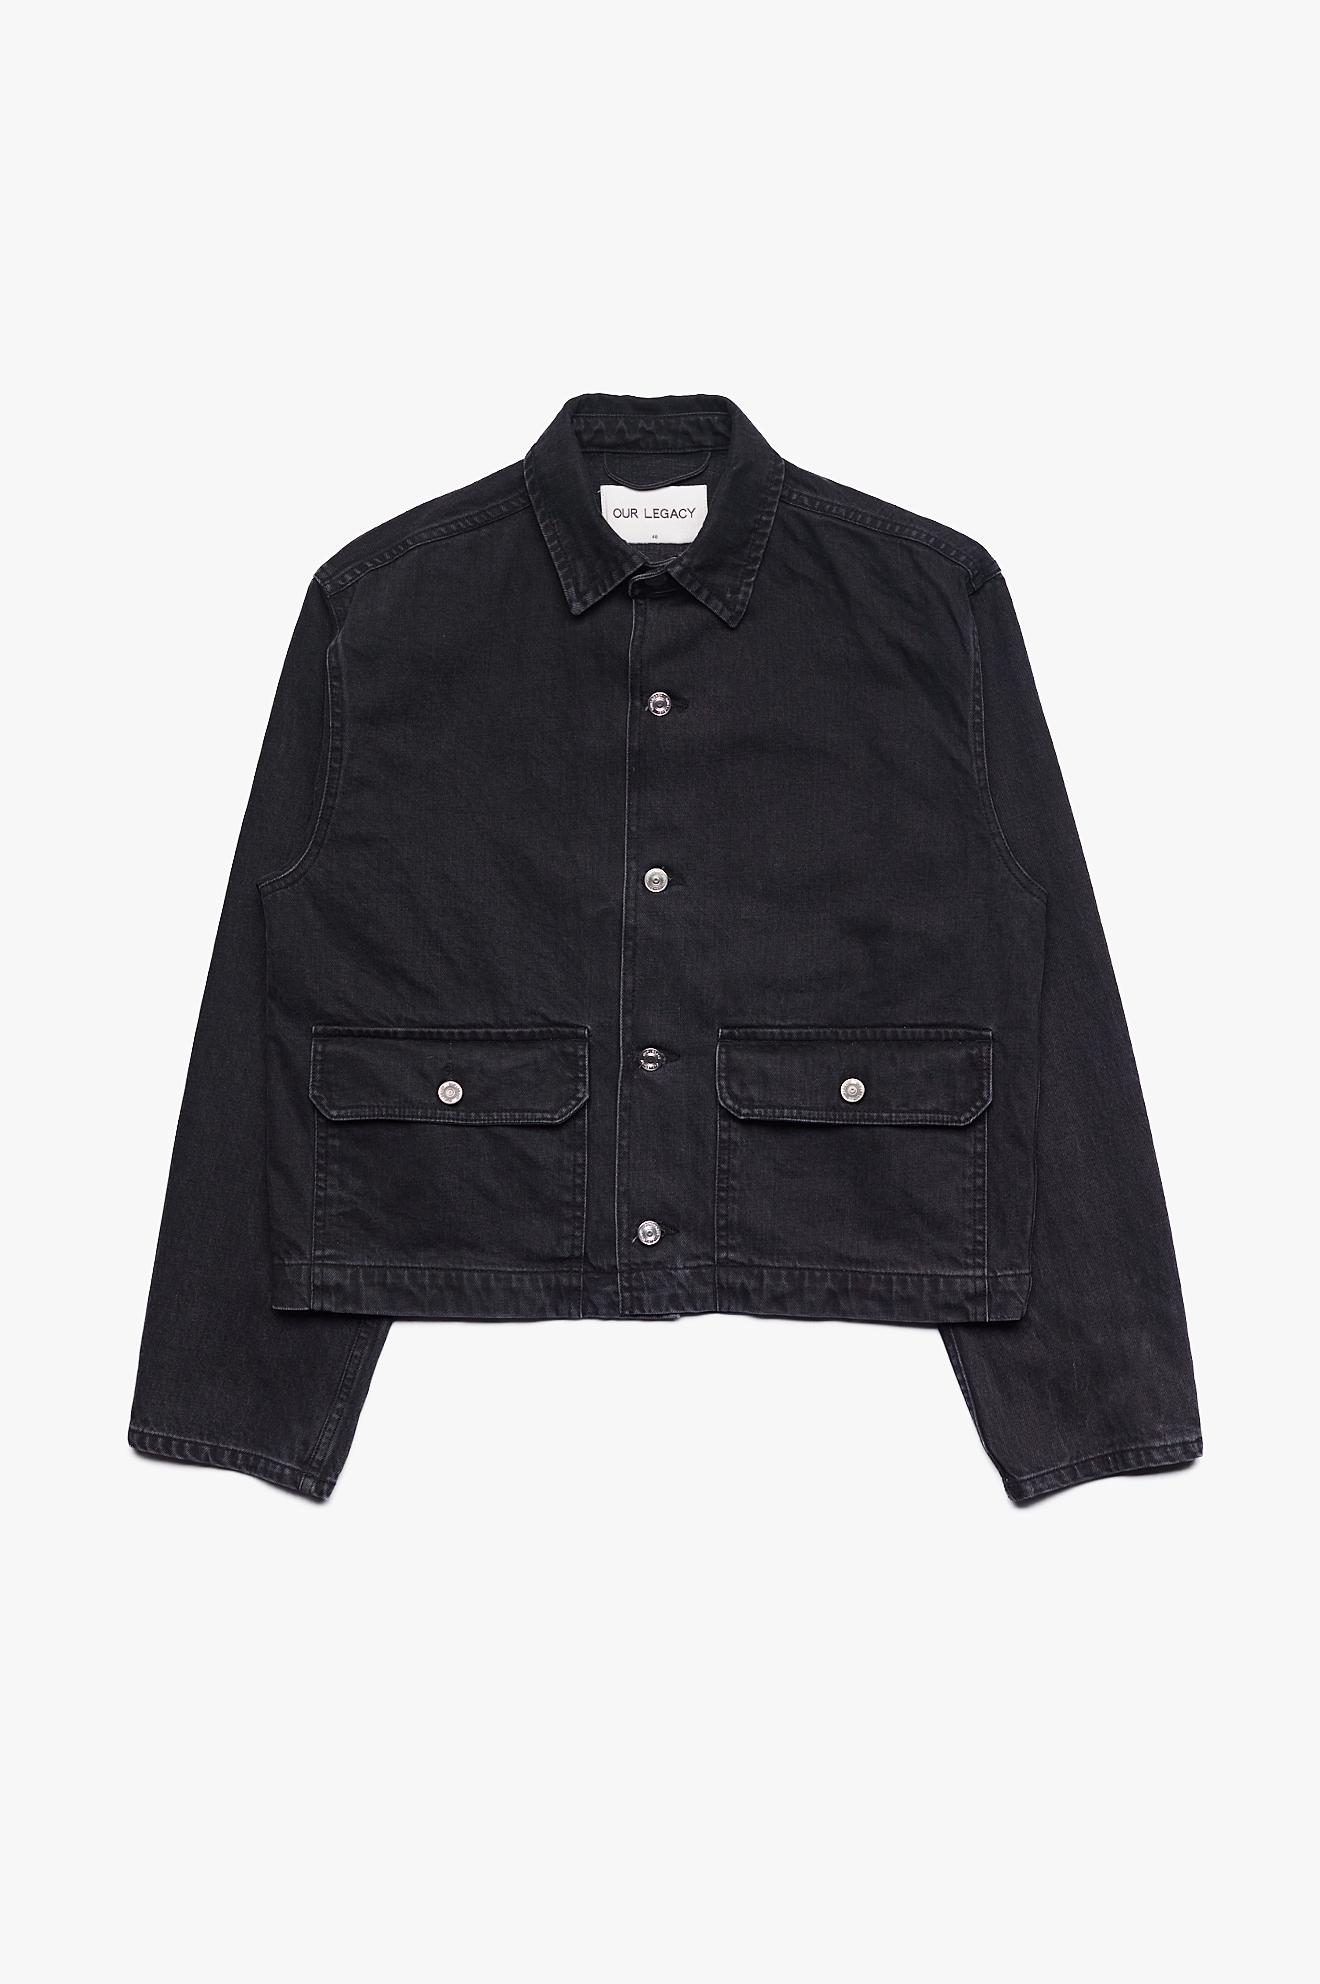 Waist Jean Jacket Black Rinse Wash